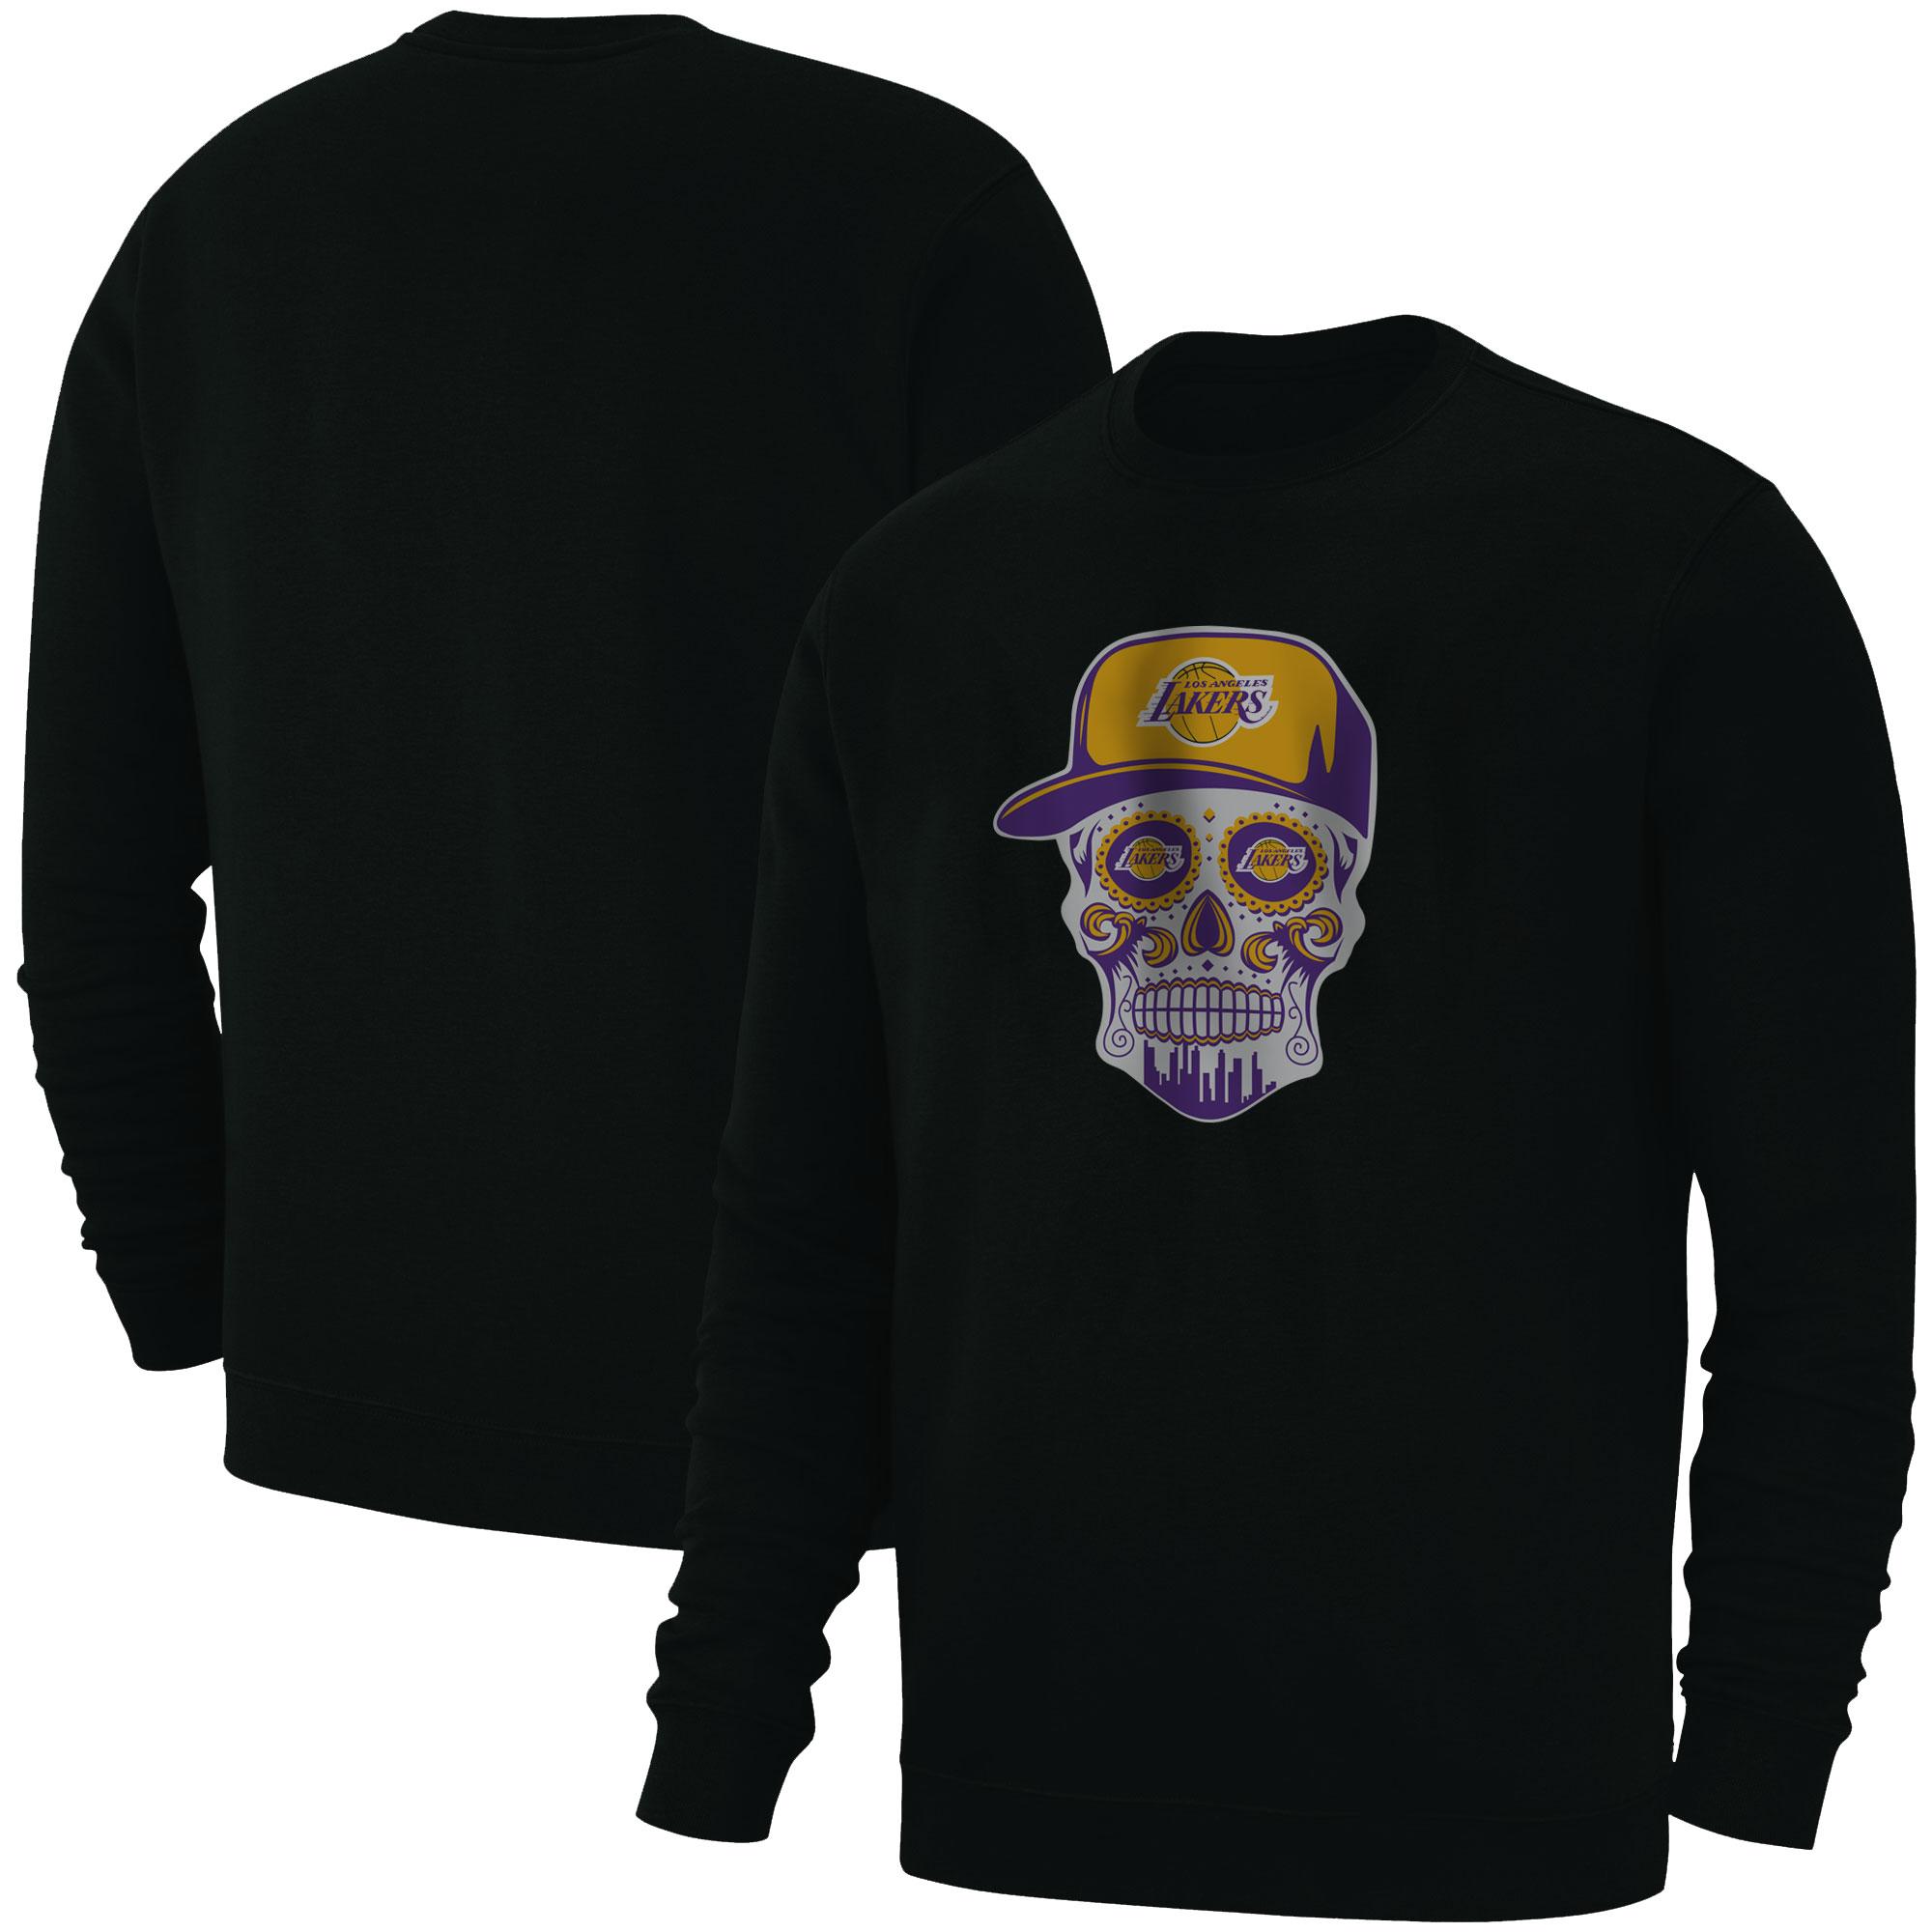 Lakers Skull Basic (BSC-BLC-NP-454-NBA-LKRS-SKULL)